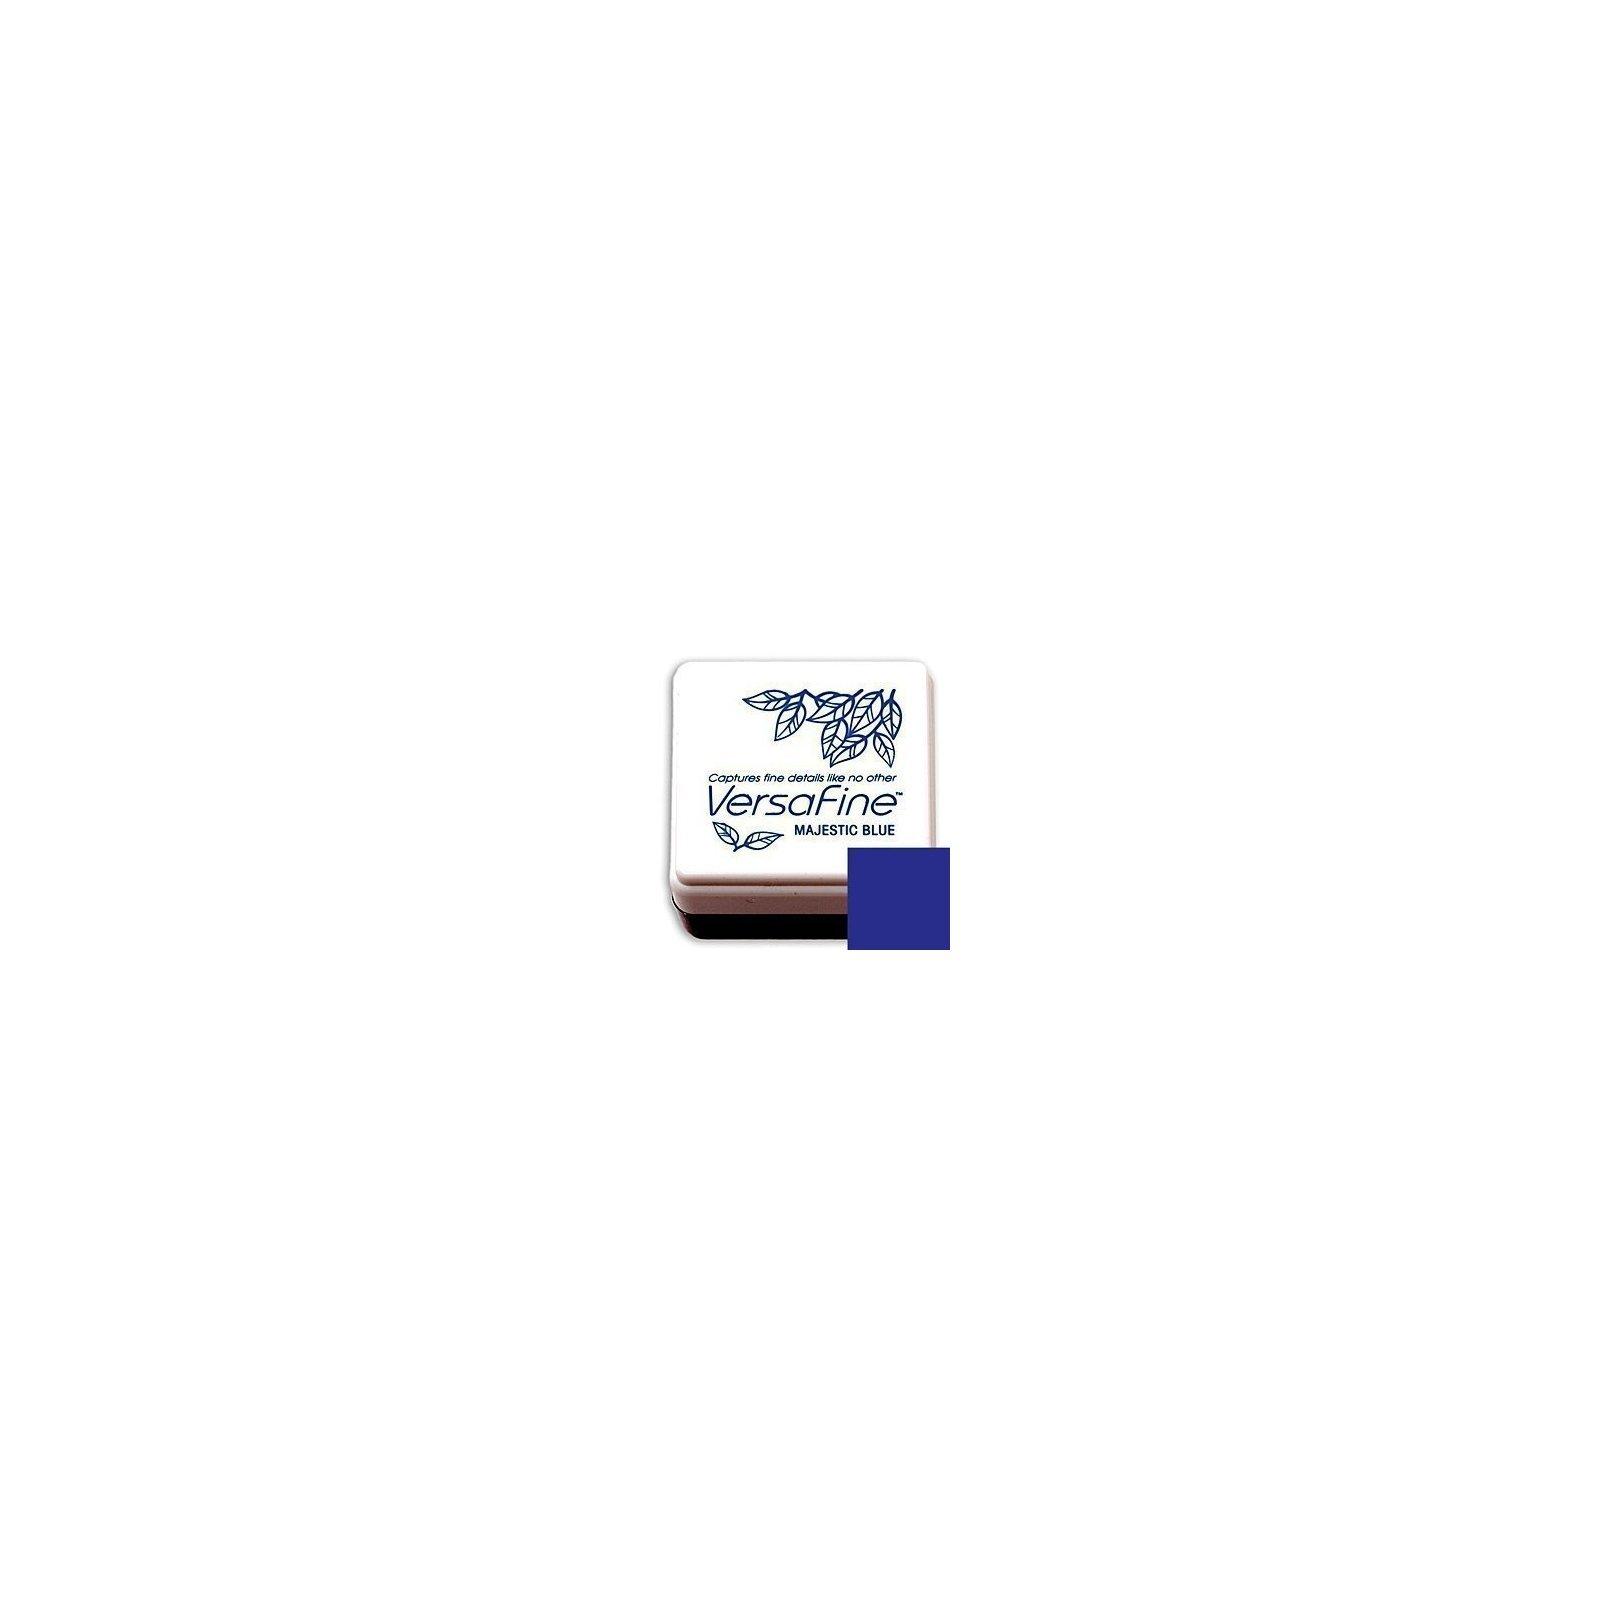 Mini-encreur Versafine bleu - Majestic Blue - Tsukineko